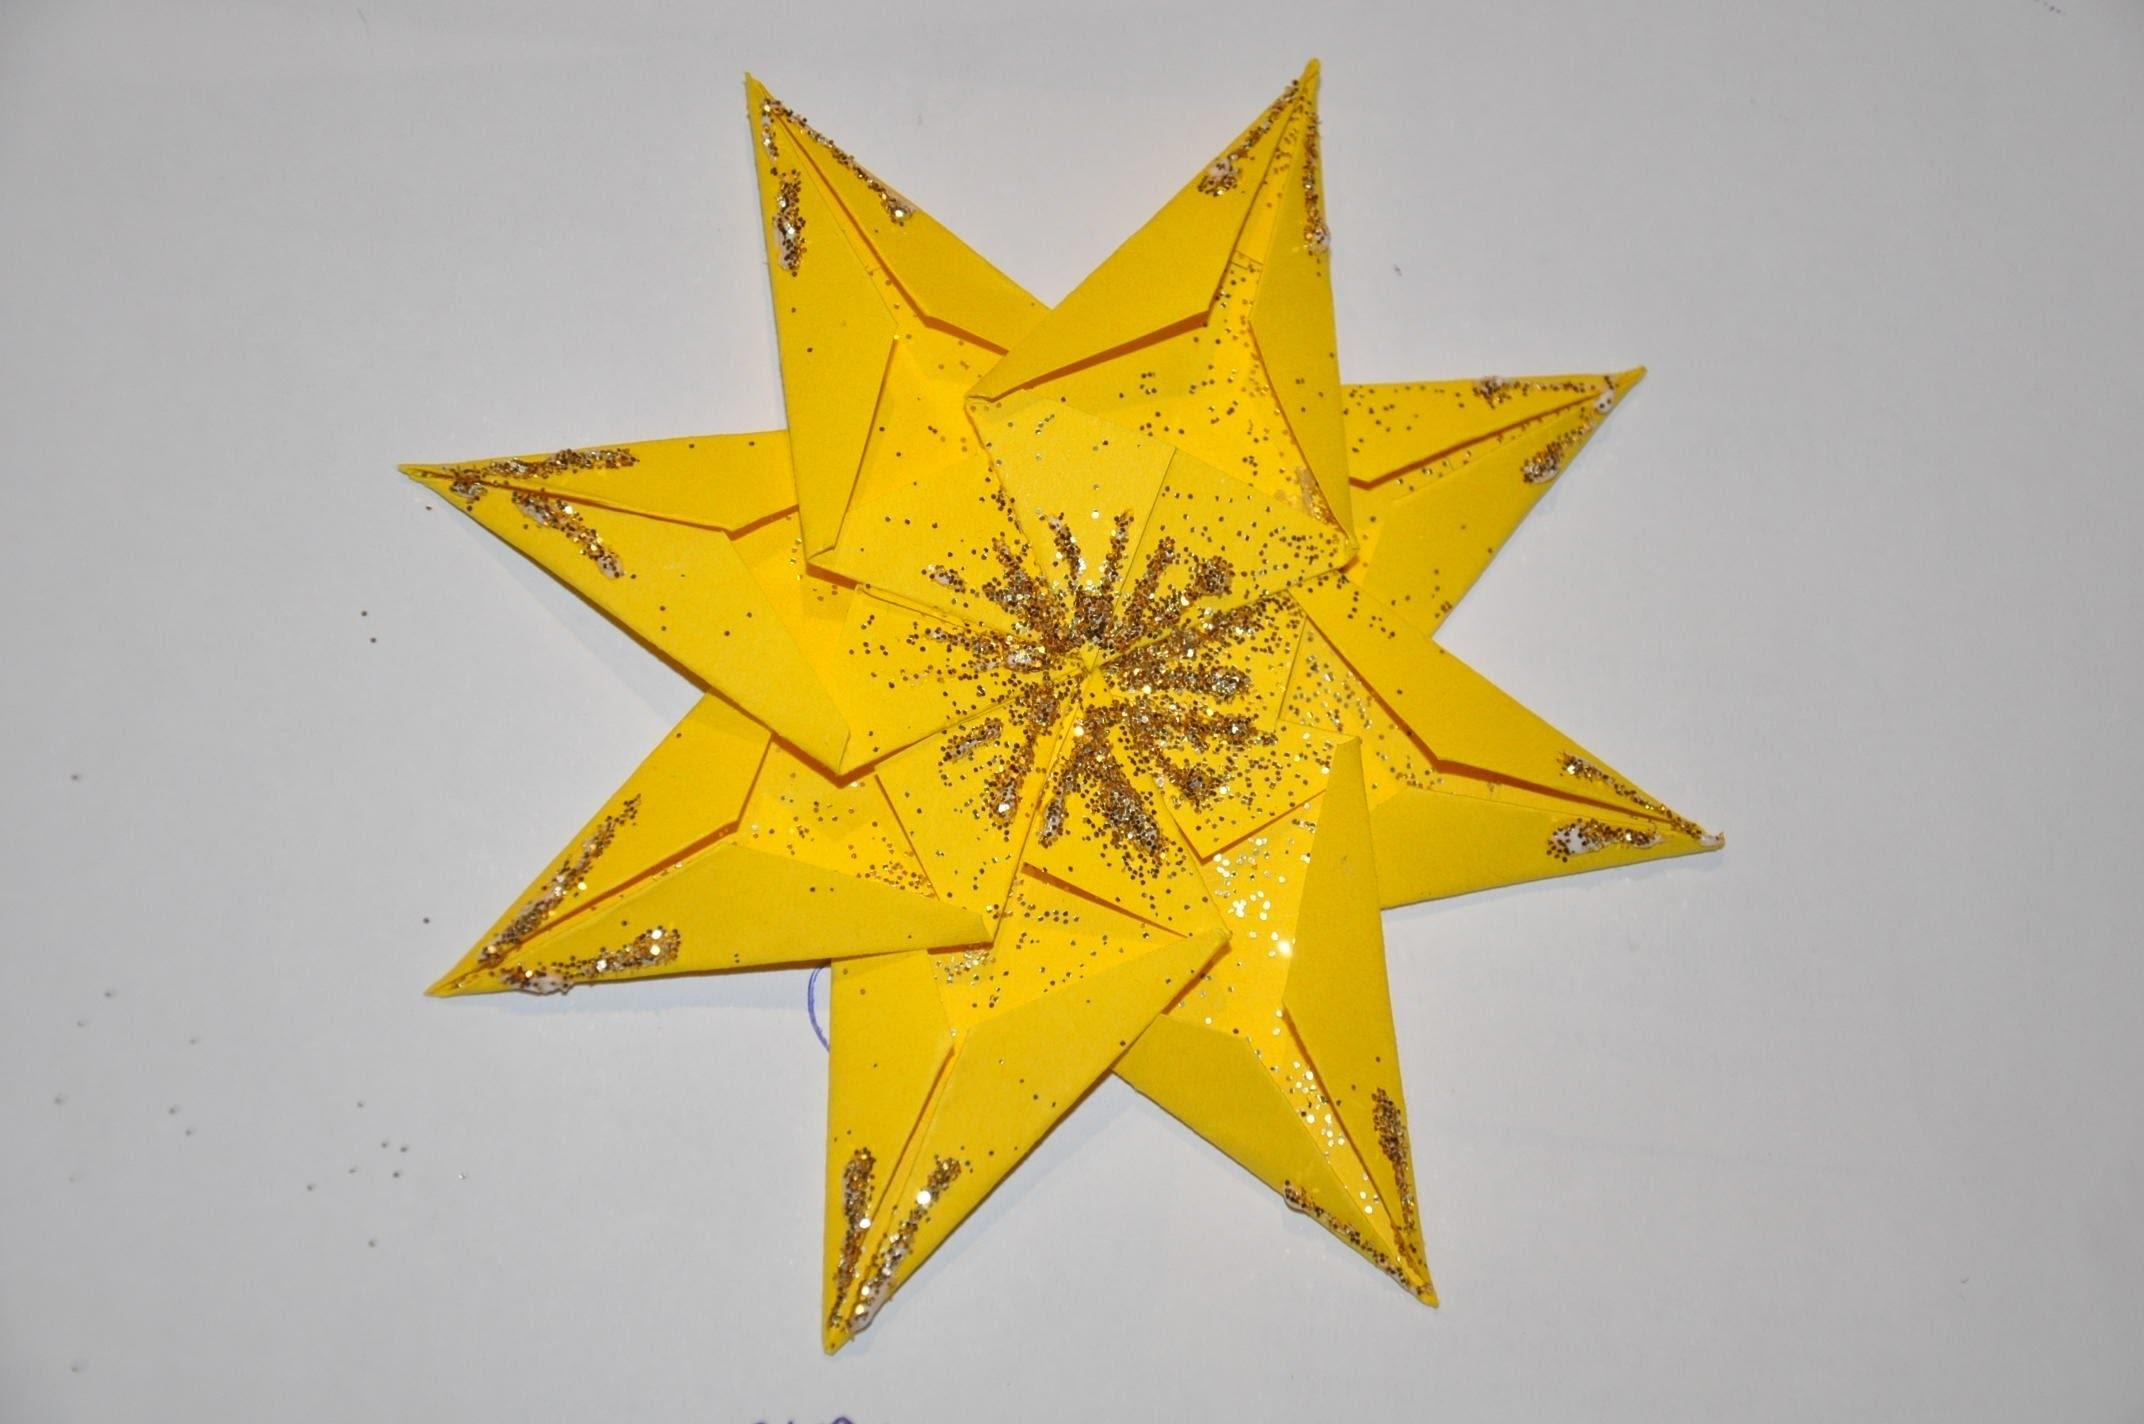 Gwiazda z papieru krok po kroku # How to make a paper star DIY